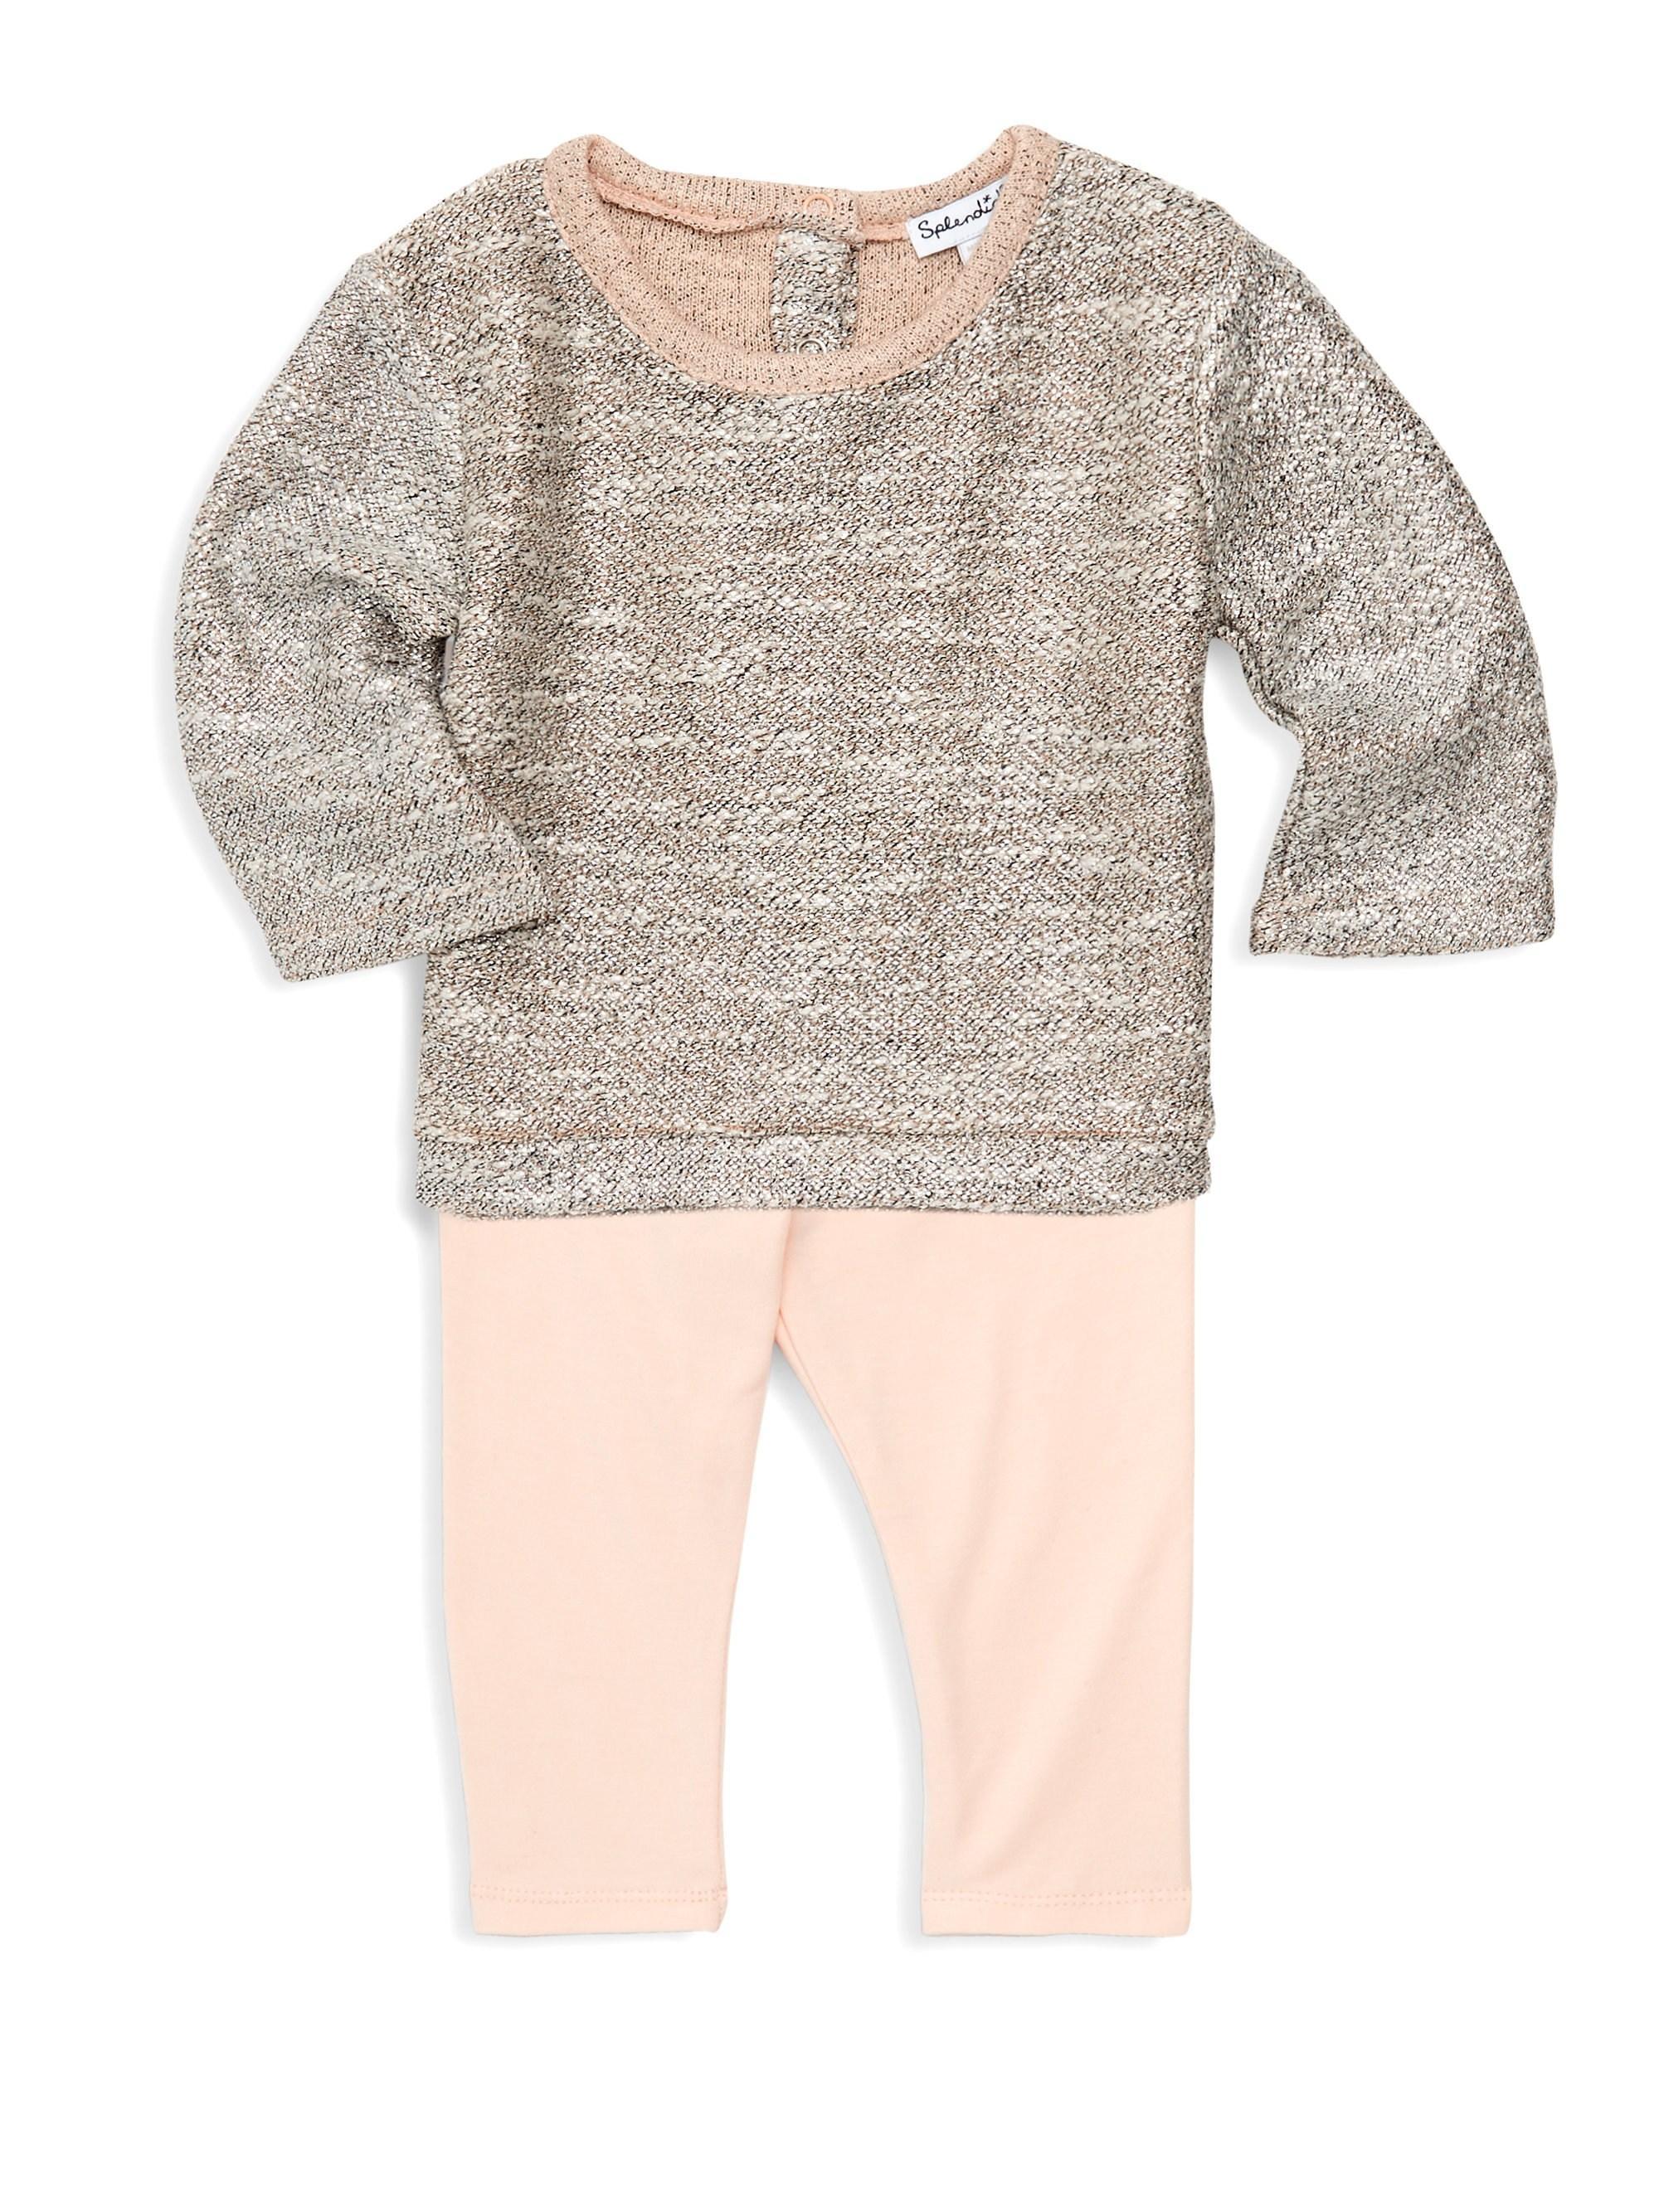 1ab5d627d61 Lyst - Splendid Baby Girl s Two-piece Lurex Sweater   Leggings Set